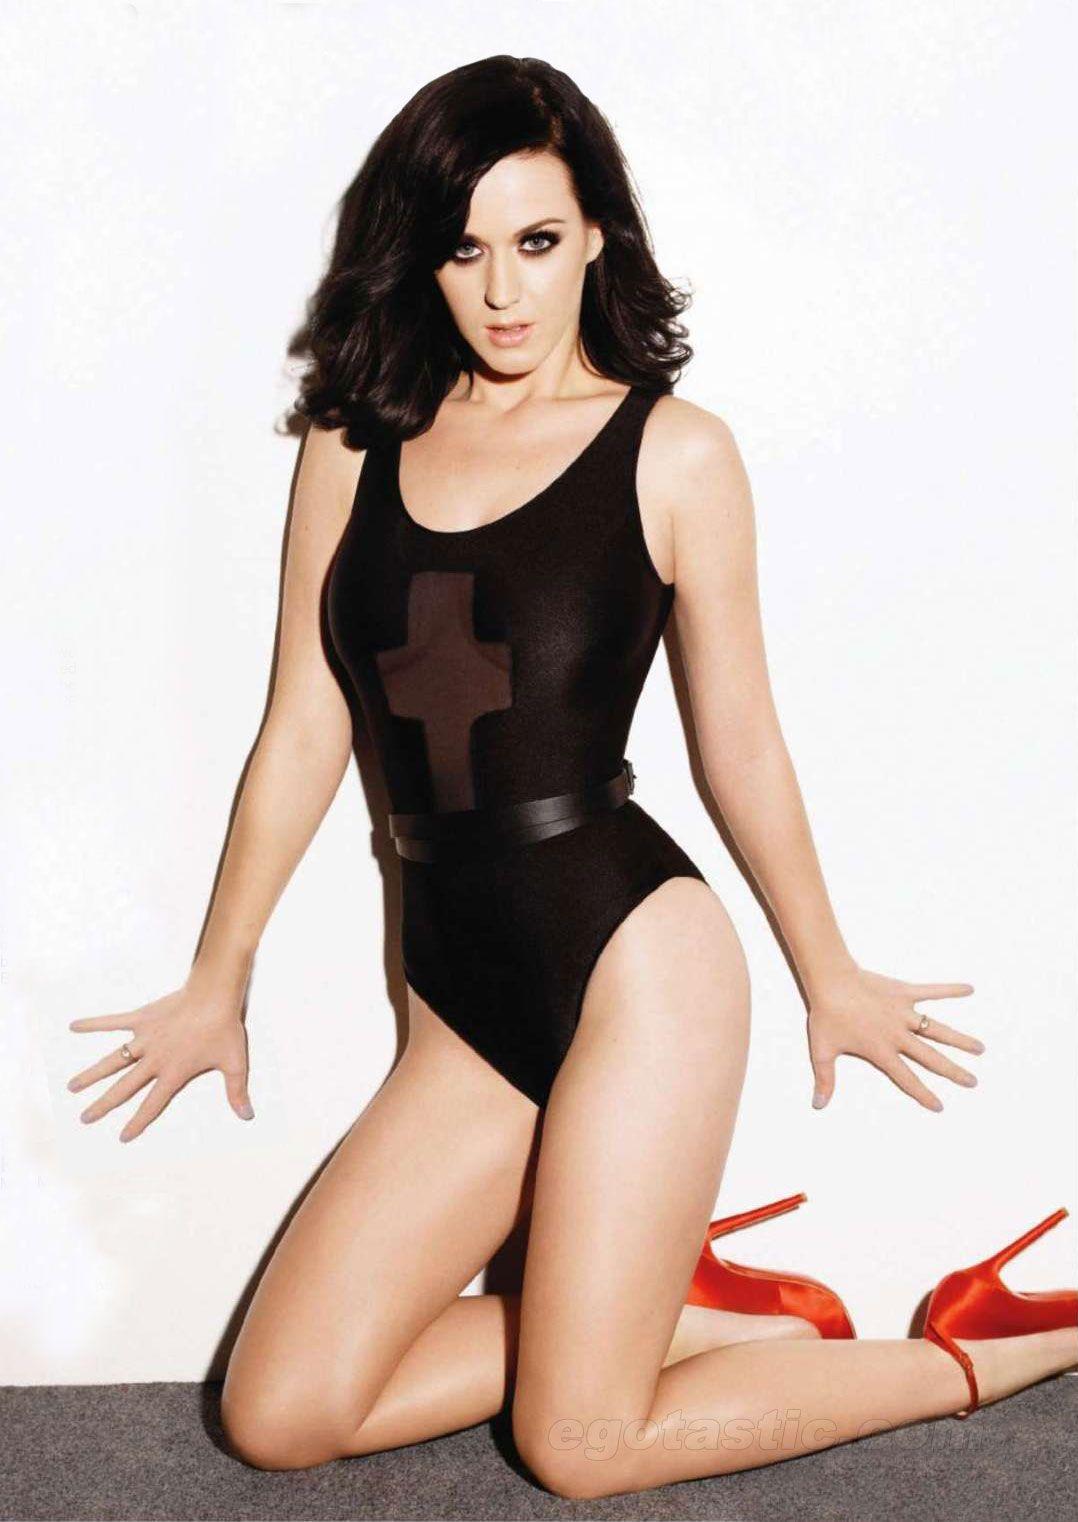 Katy Perry Hot Katy Perry Hot Pics Katy Perry Sexy